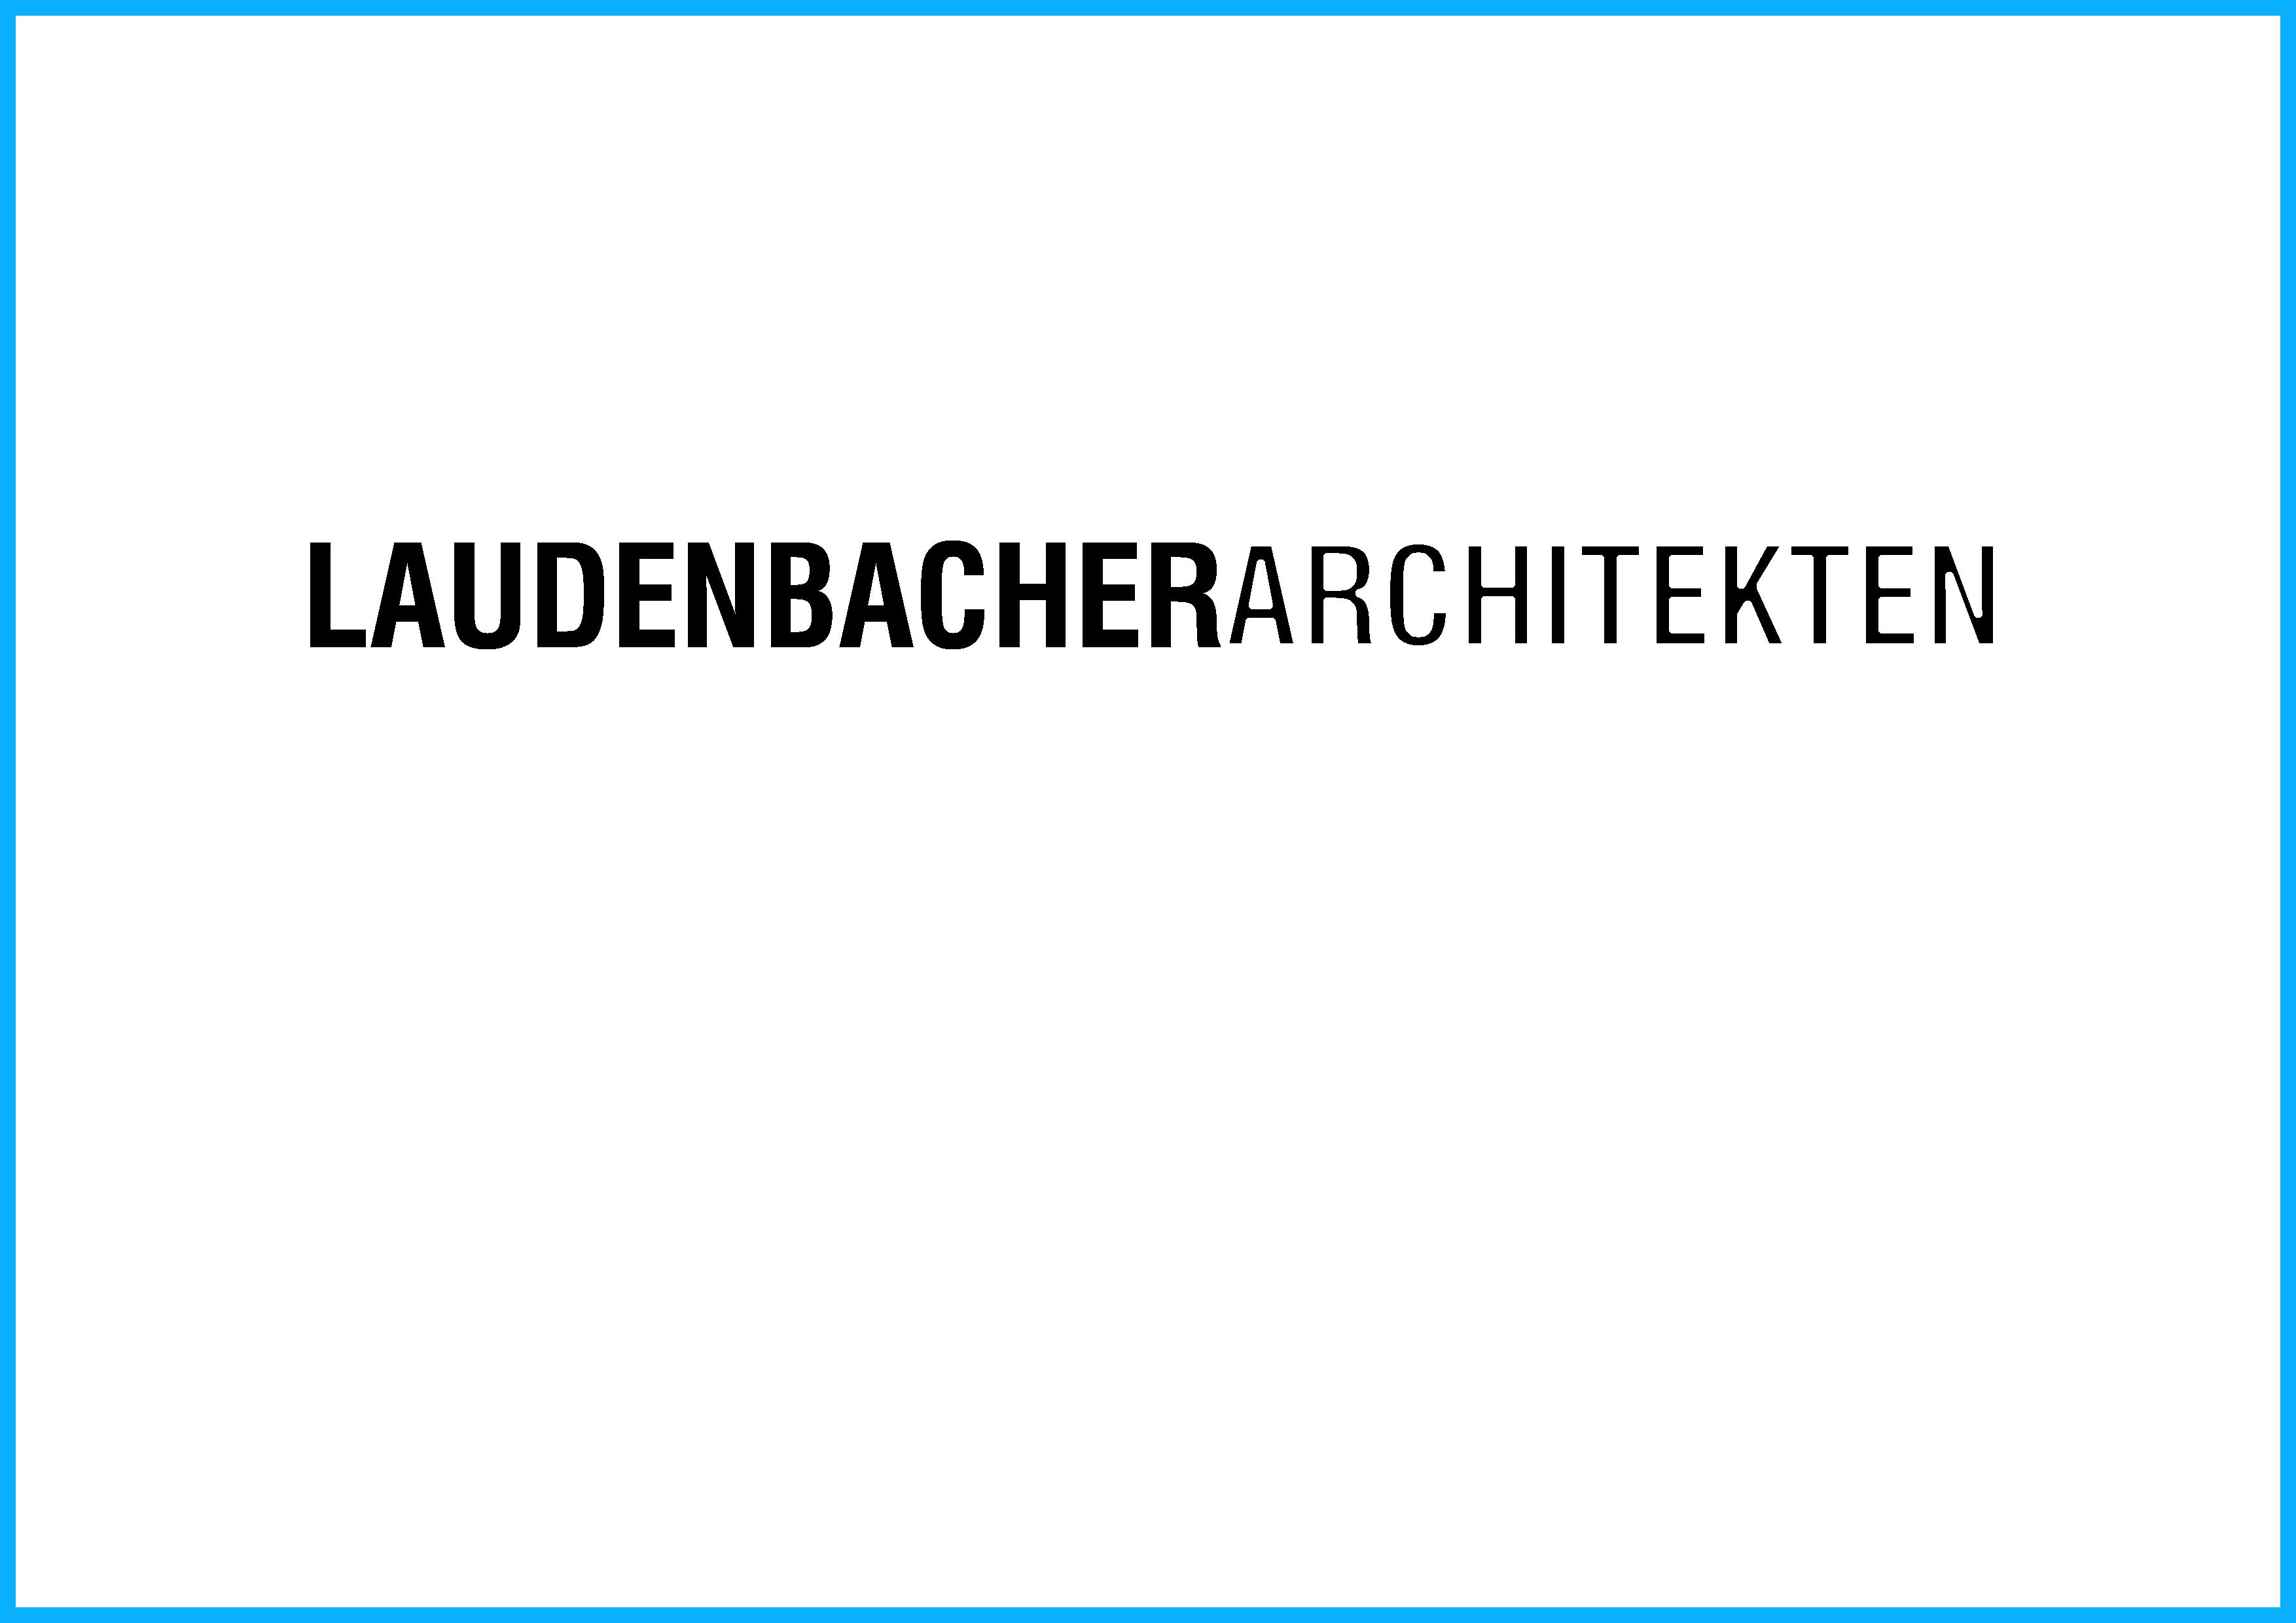 LOGO LAUDENBACHERARCHITEKTEN